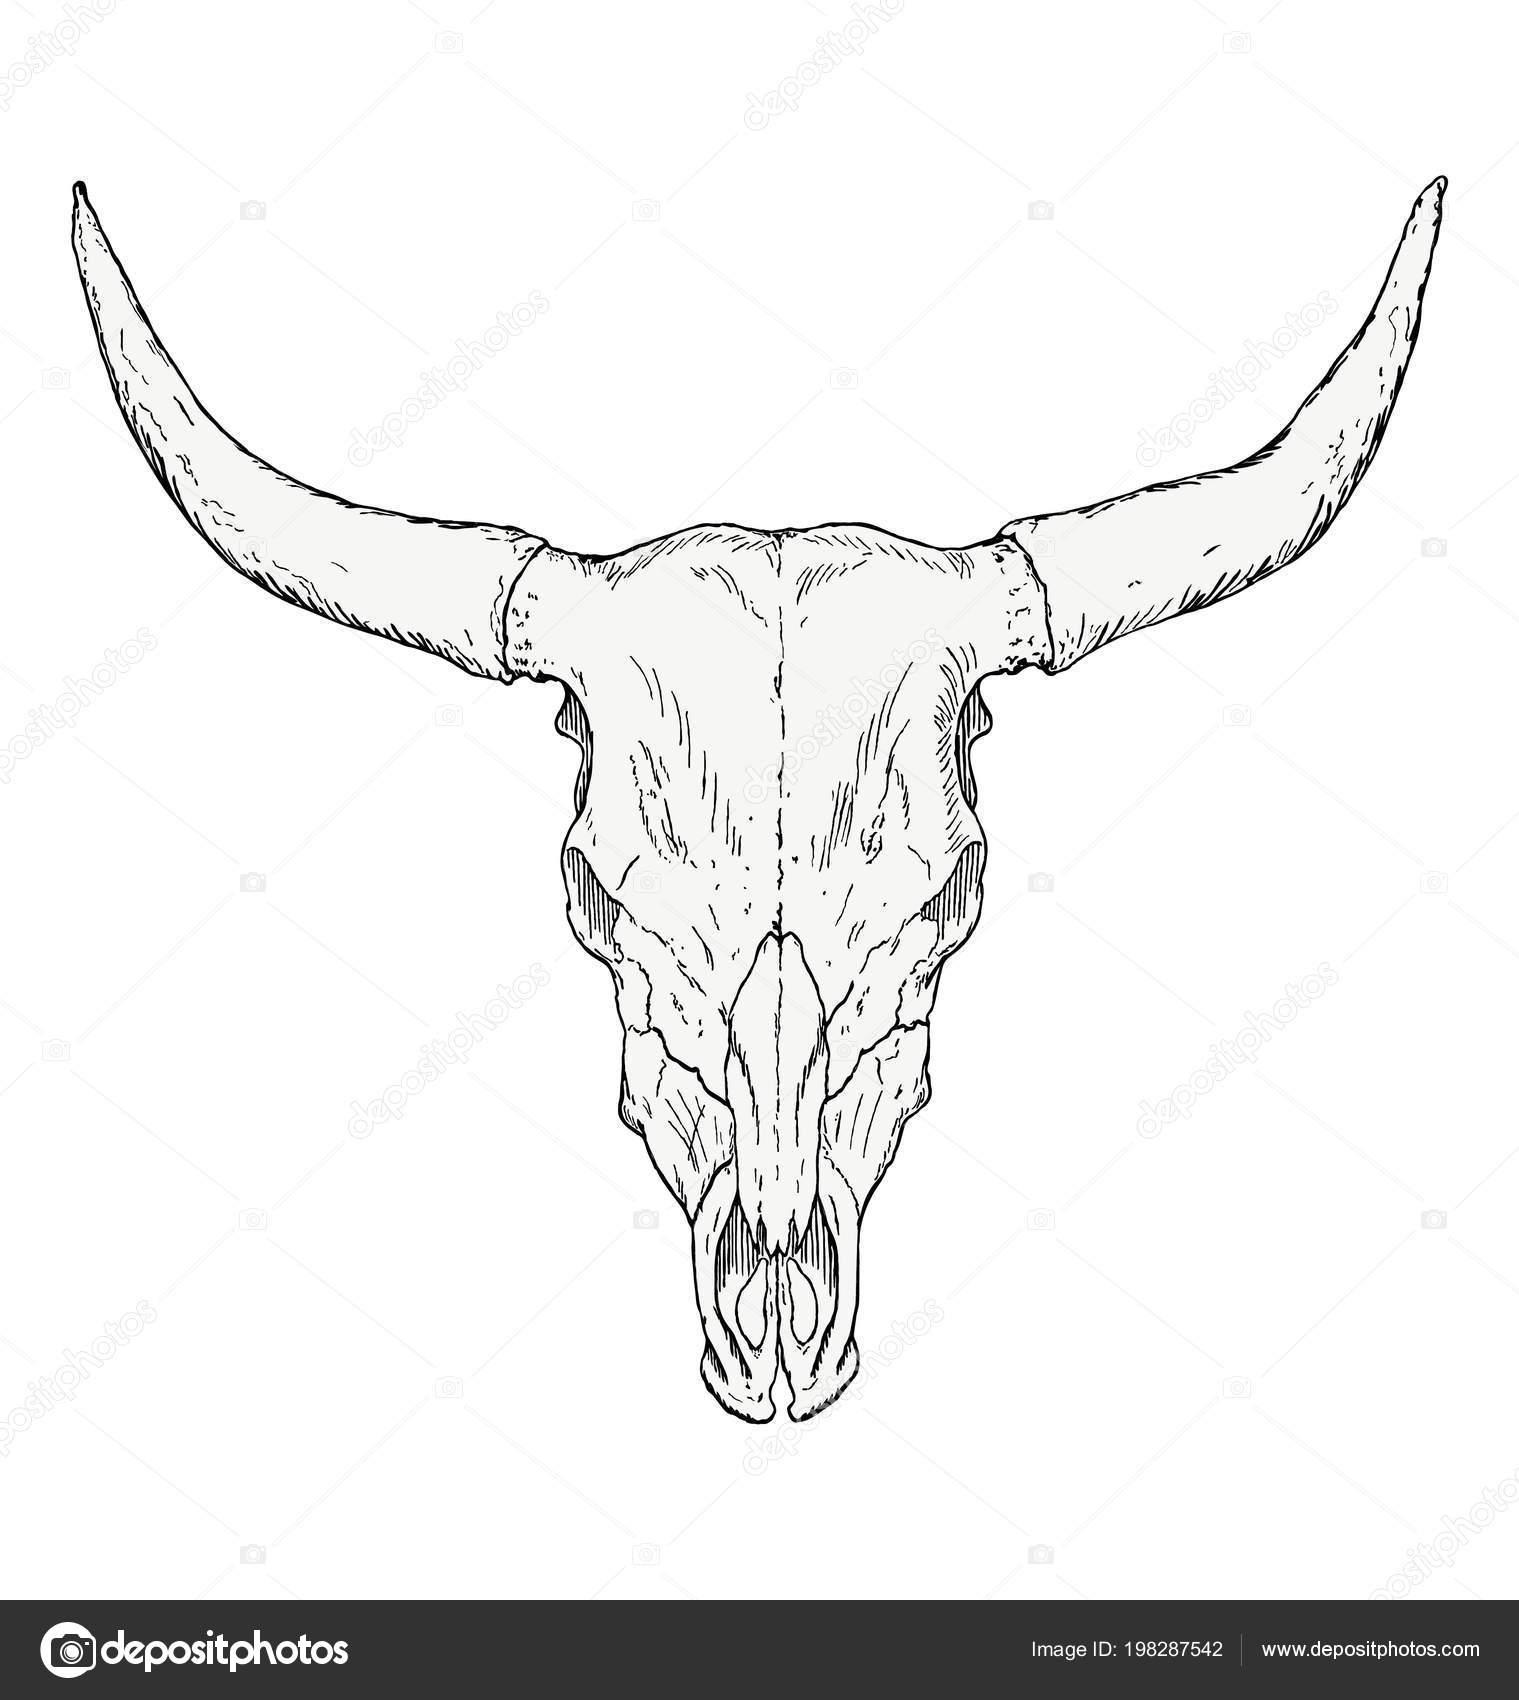 Crâne Taureau Dessin Main Image Vectorielle Blacklava36 198287542